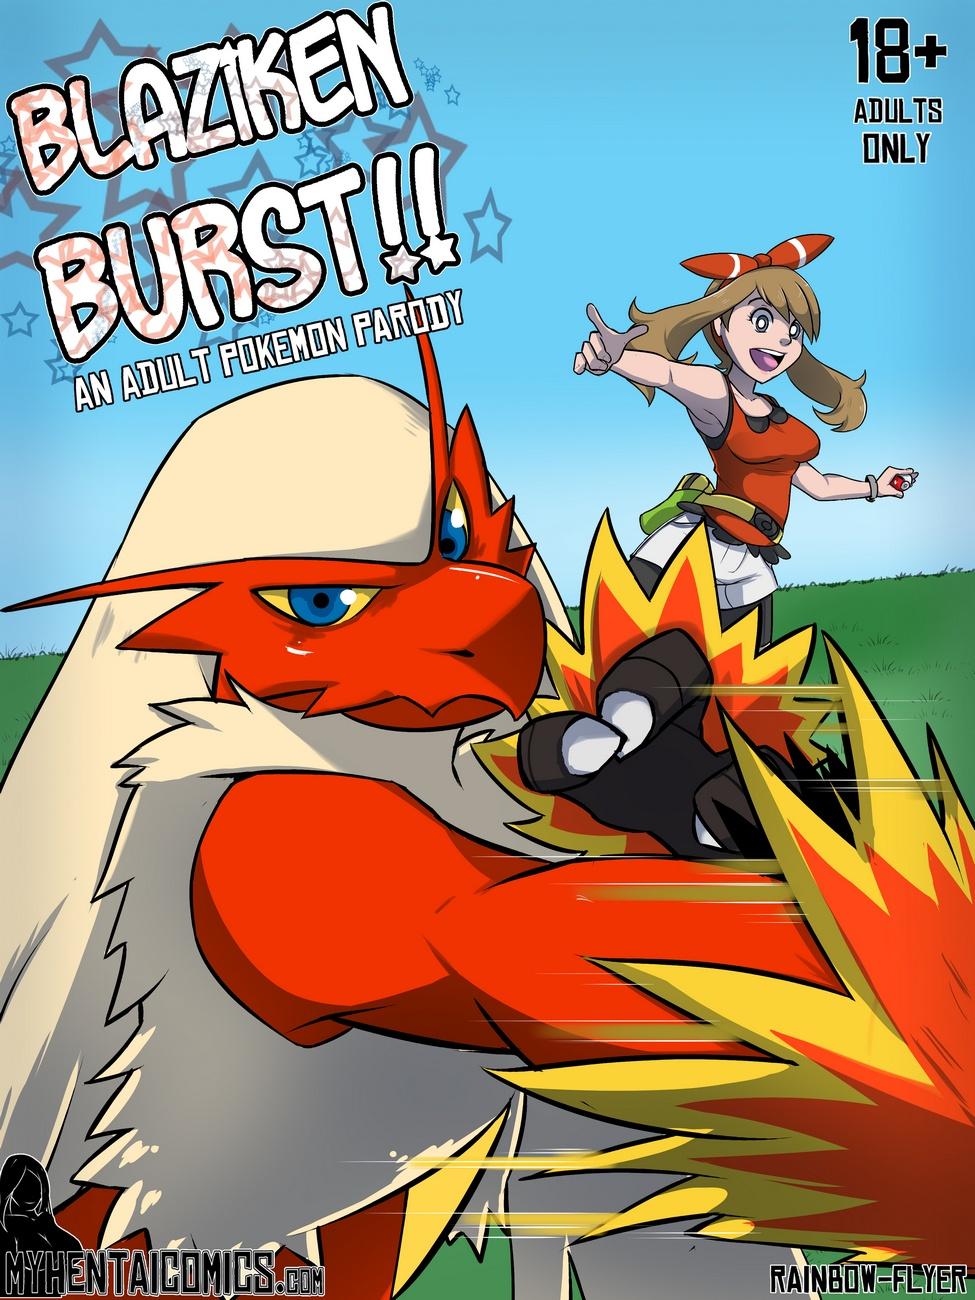 Blaziken Burst!! - 00_Cover